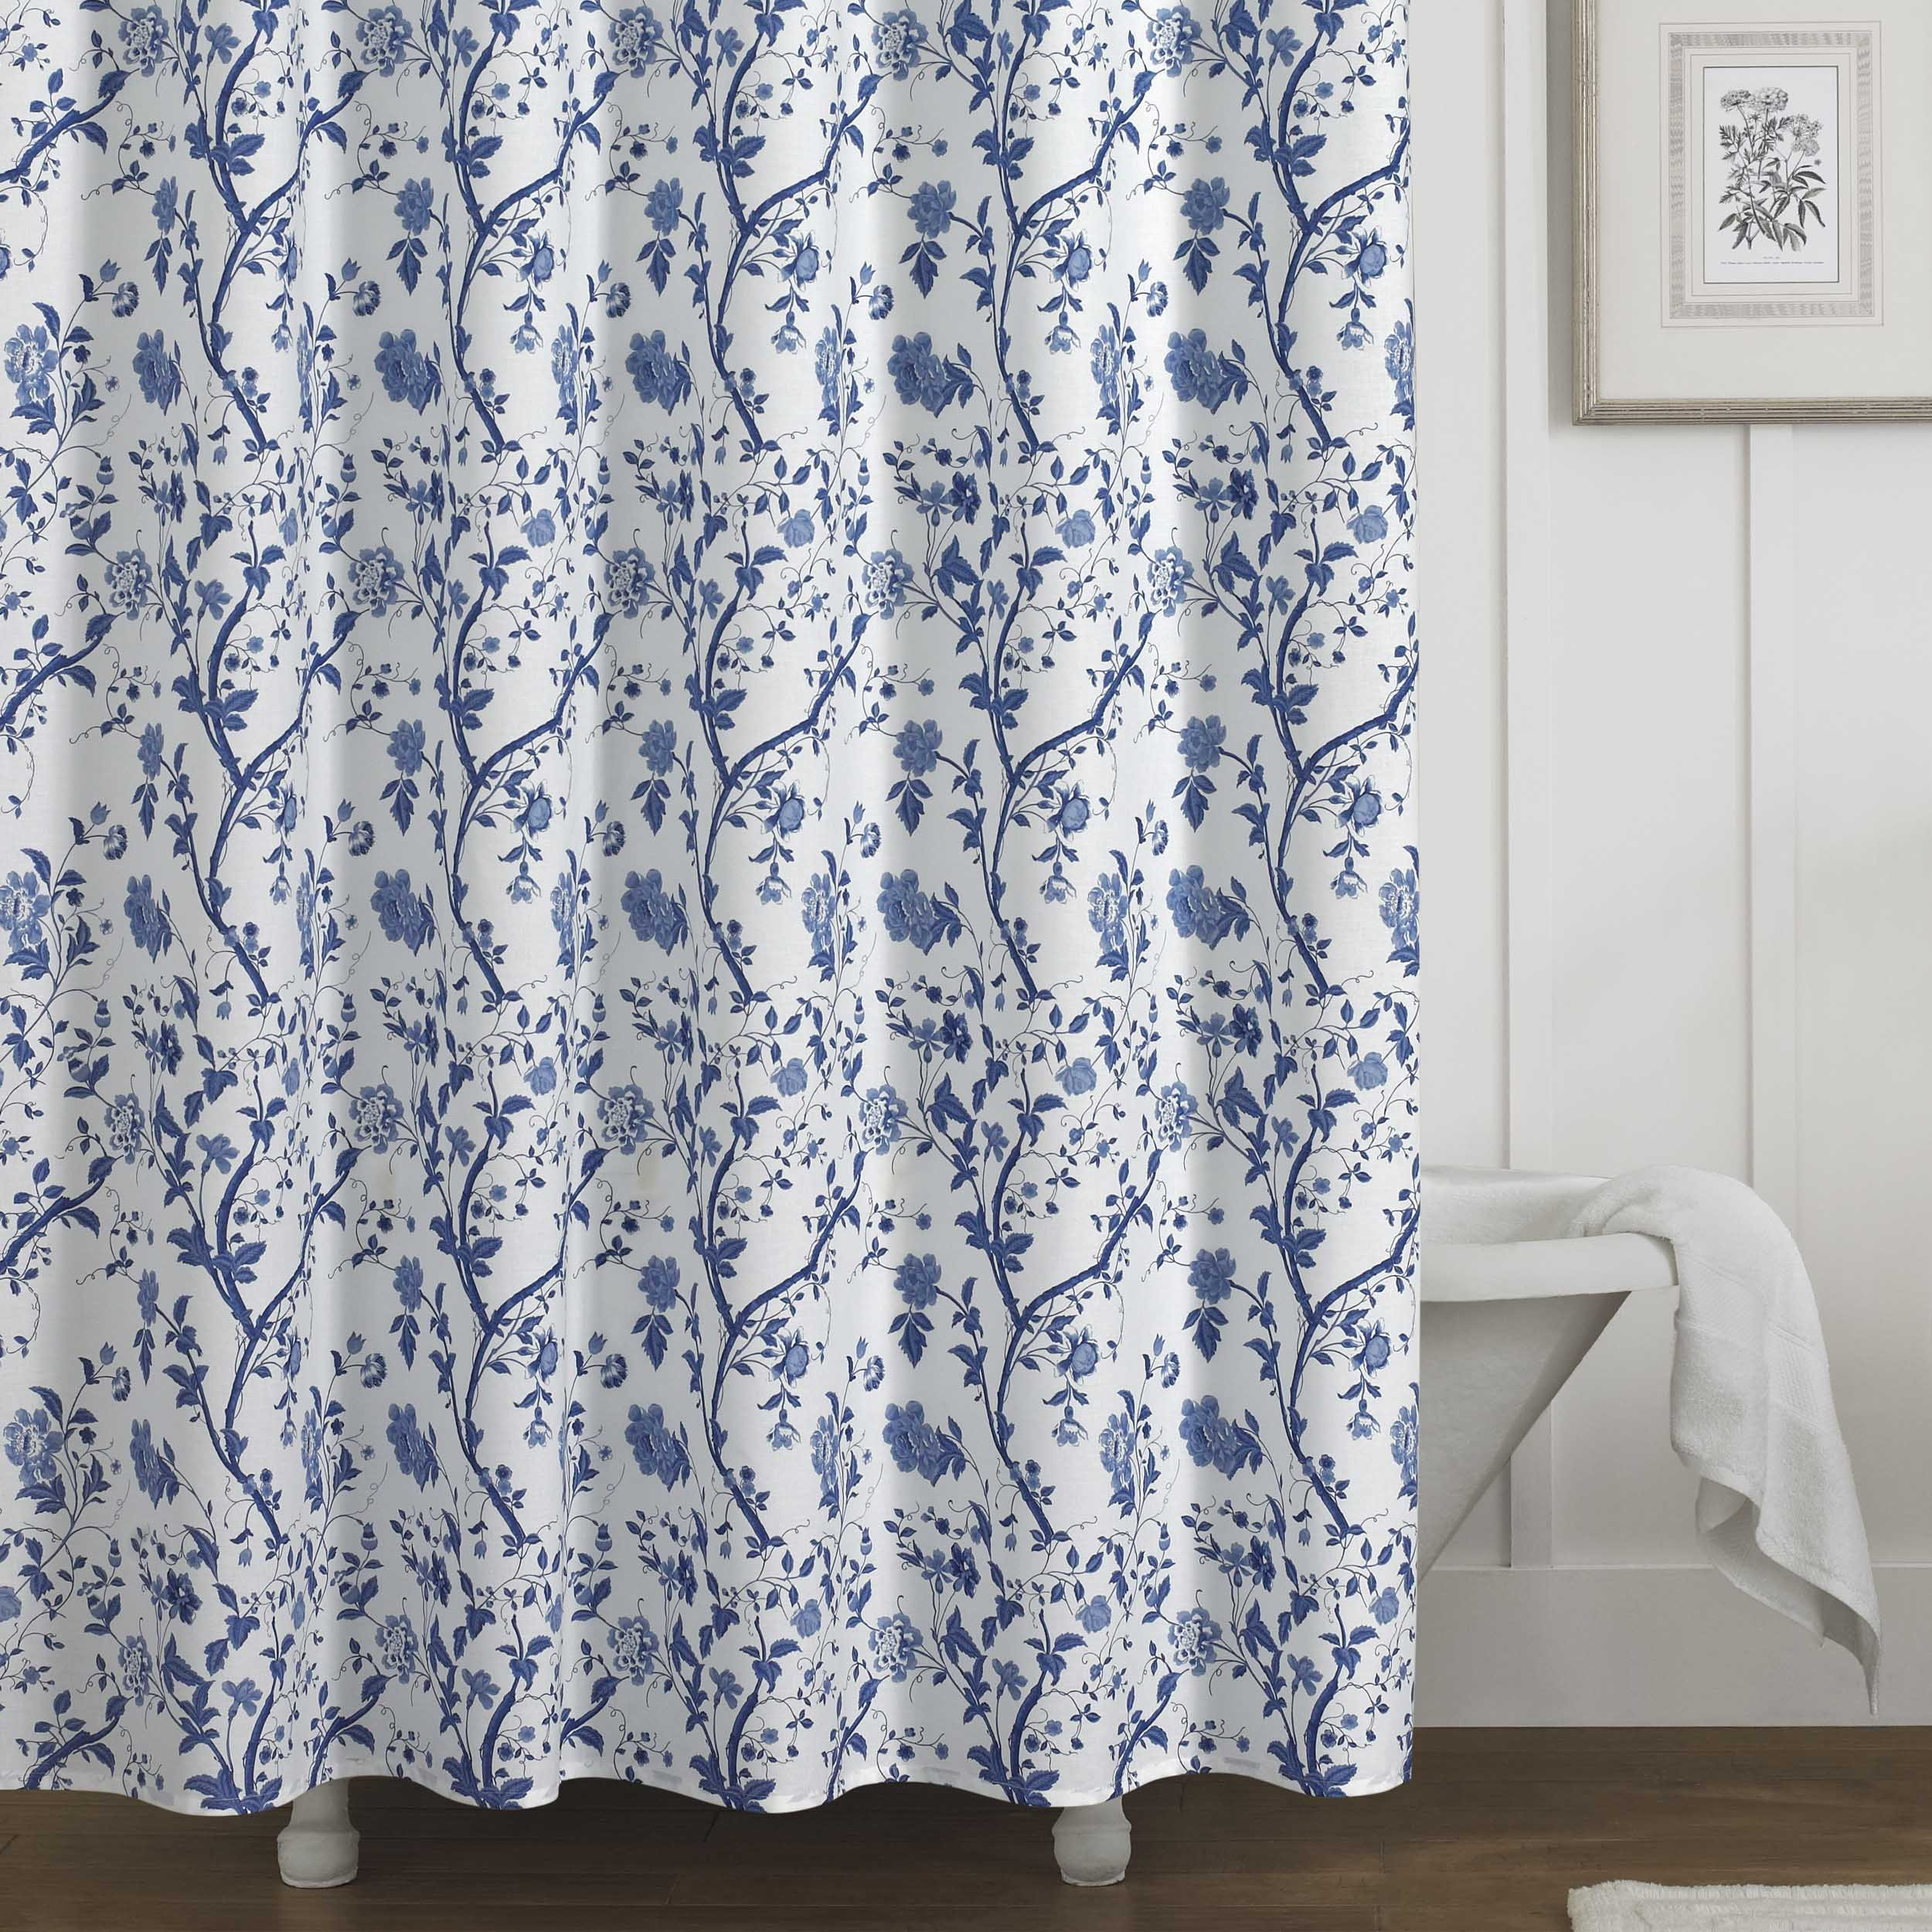 Laura Ashley Charlotte Shower Curtain, Blue